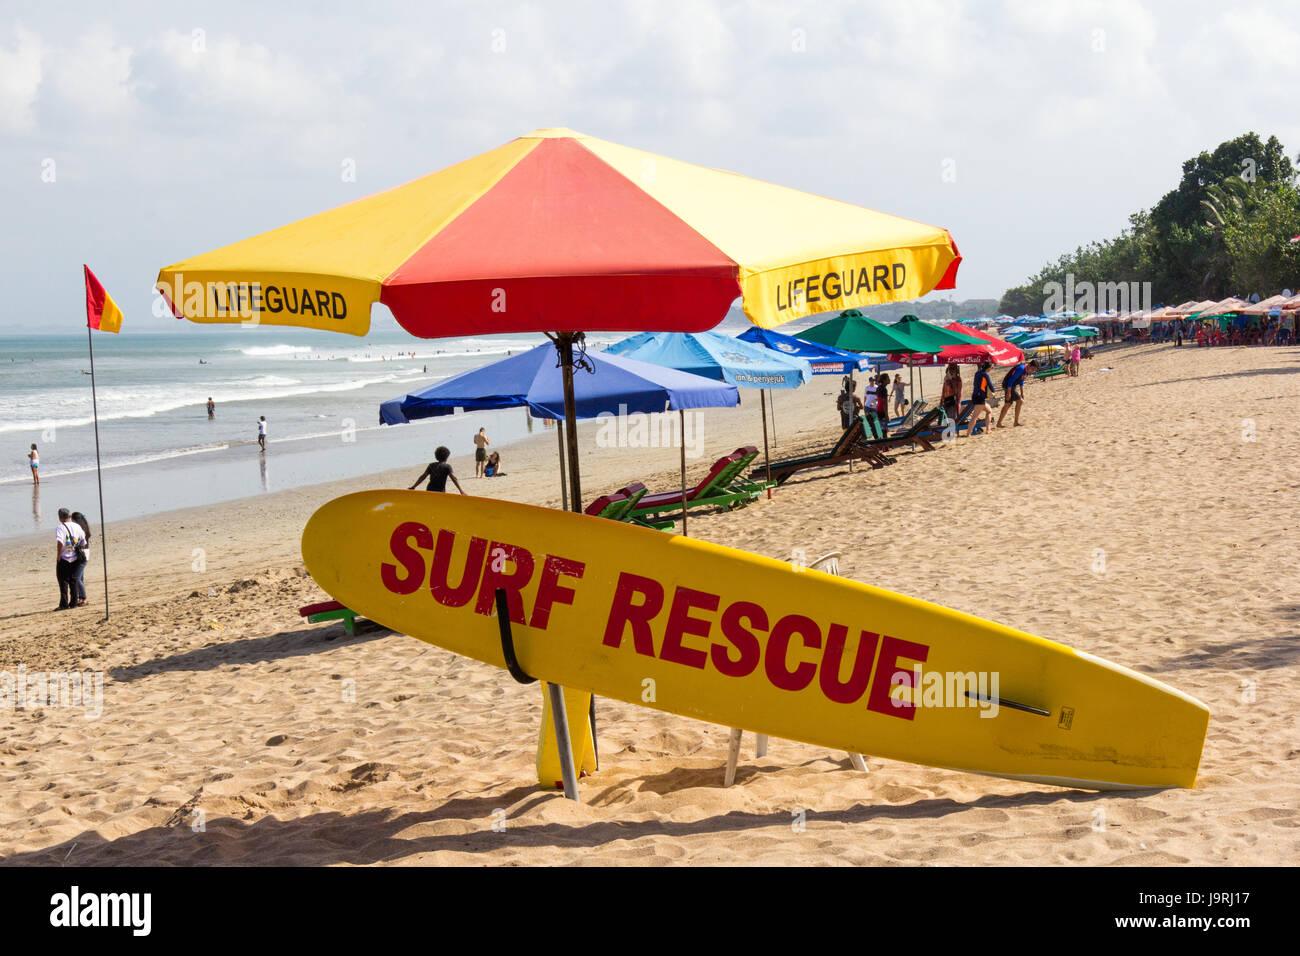 Lifeguard and surf rescue equipment, Kuta Beach, Bali, Indonesia - Stock Image